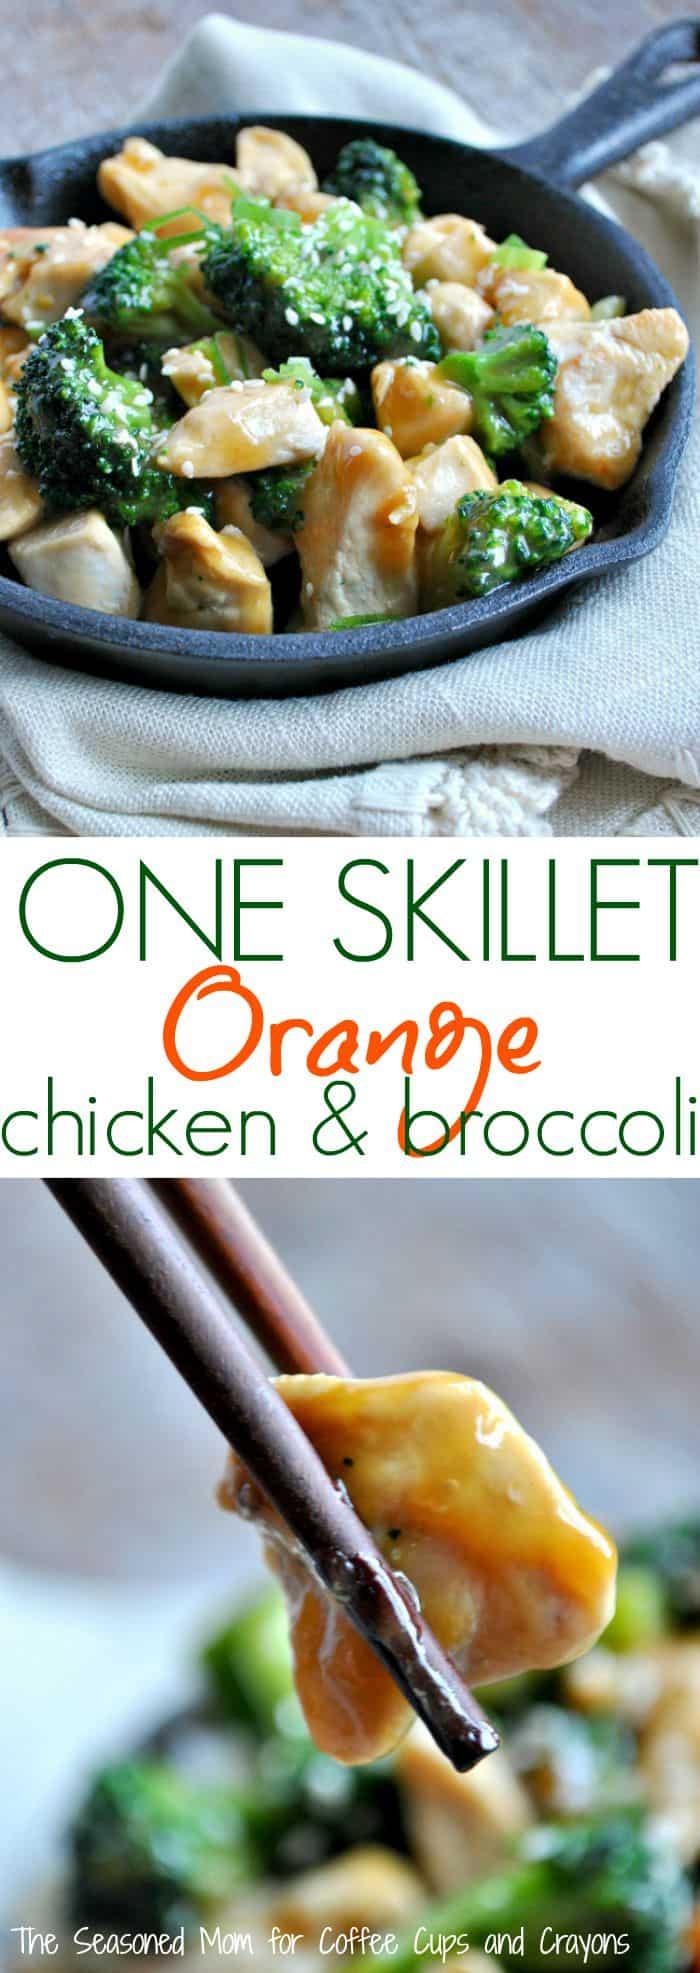 One Skillet Orange Chicken and Broccoli